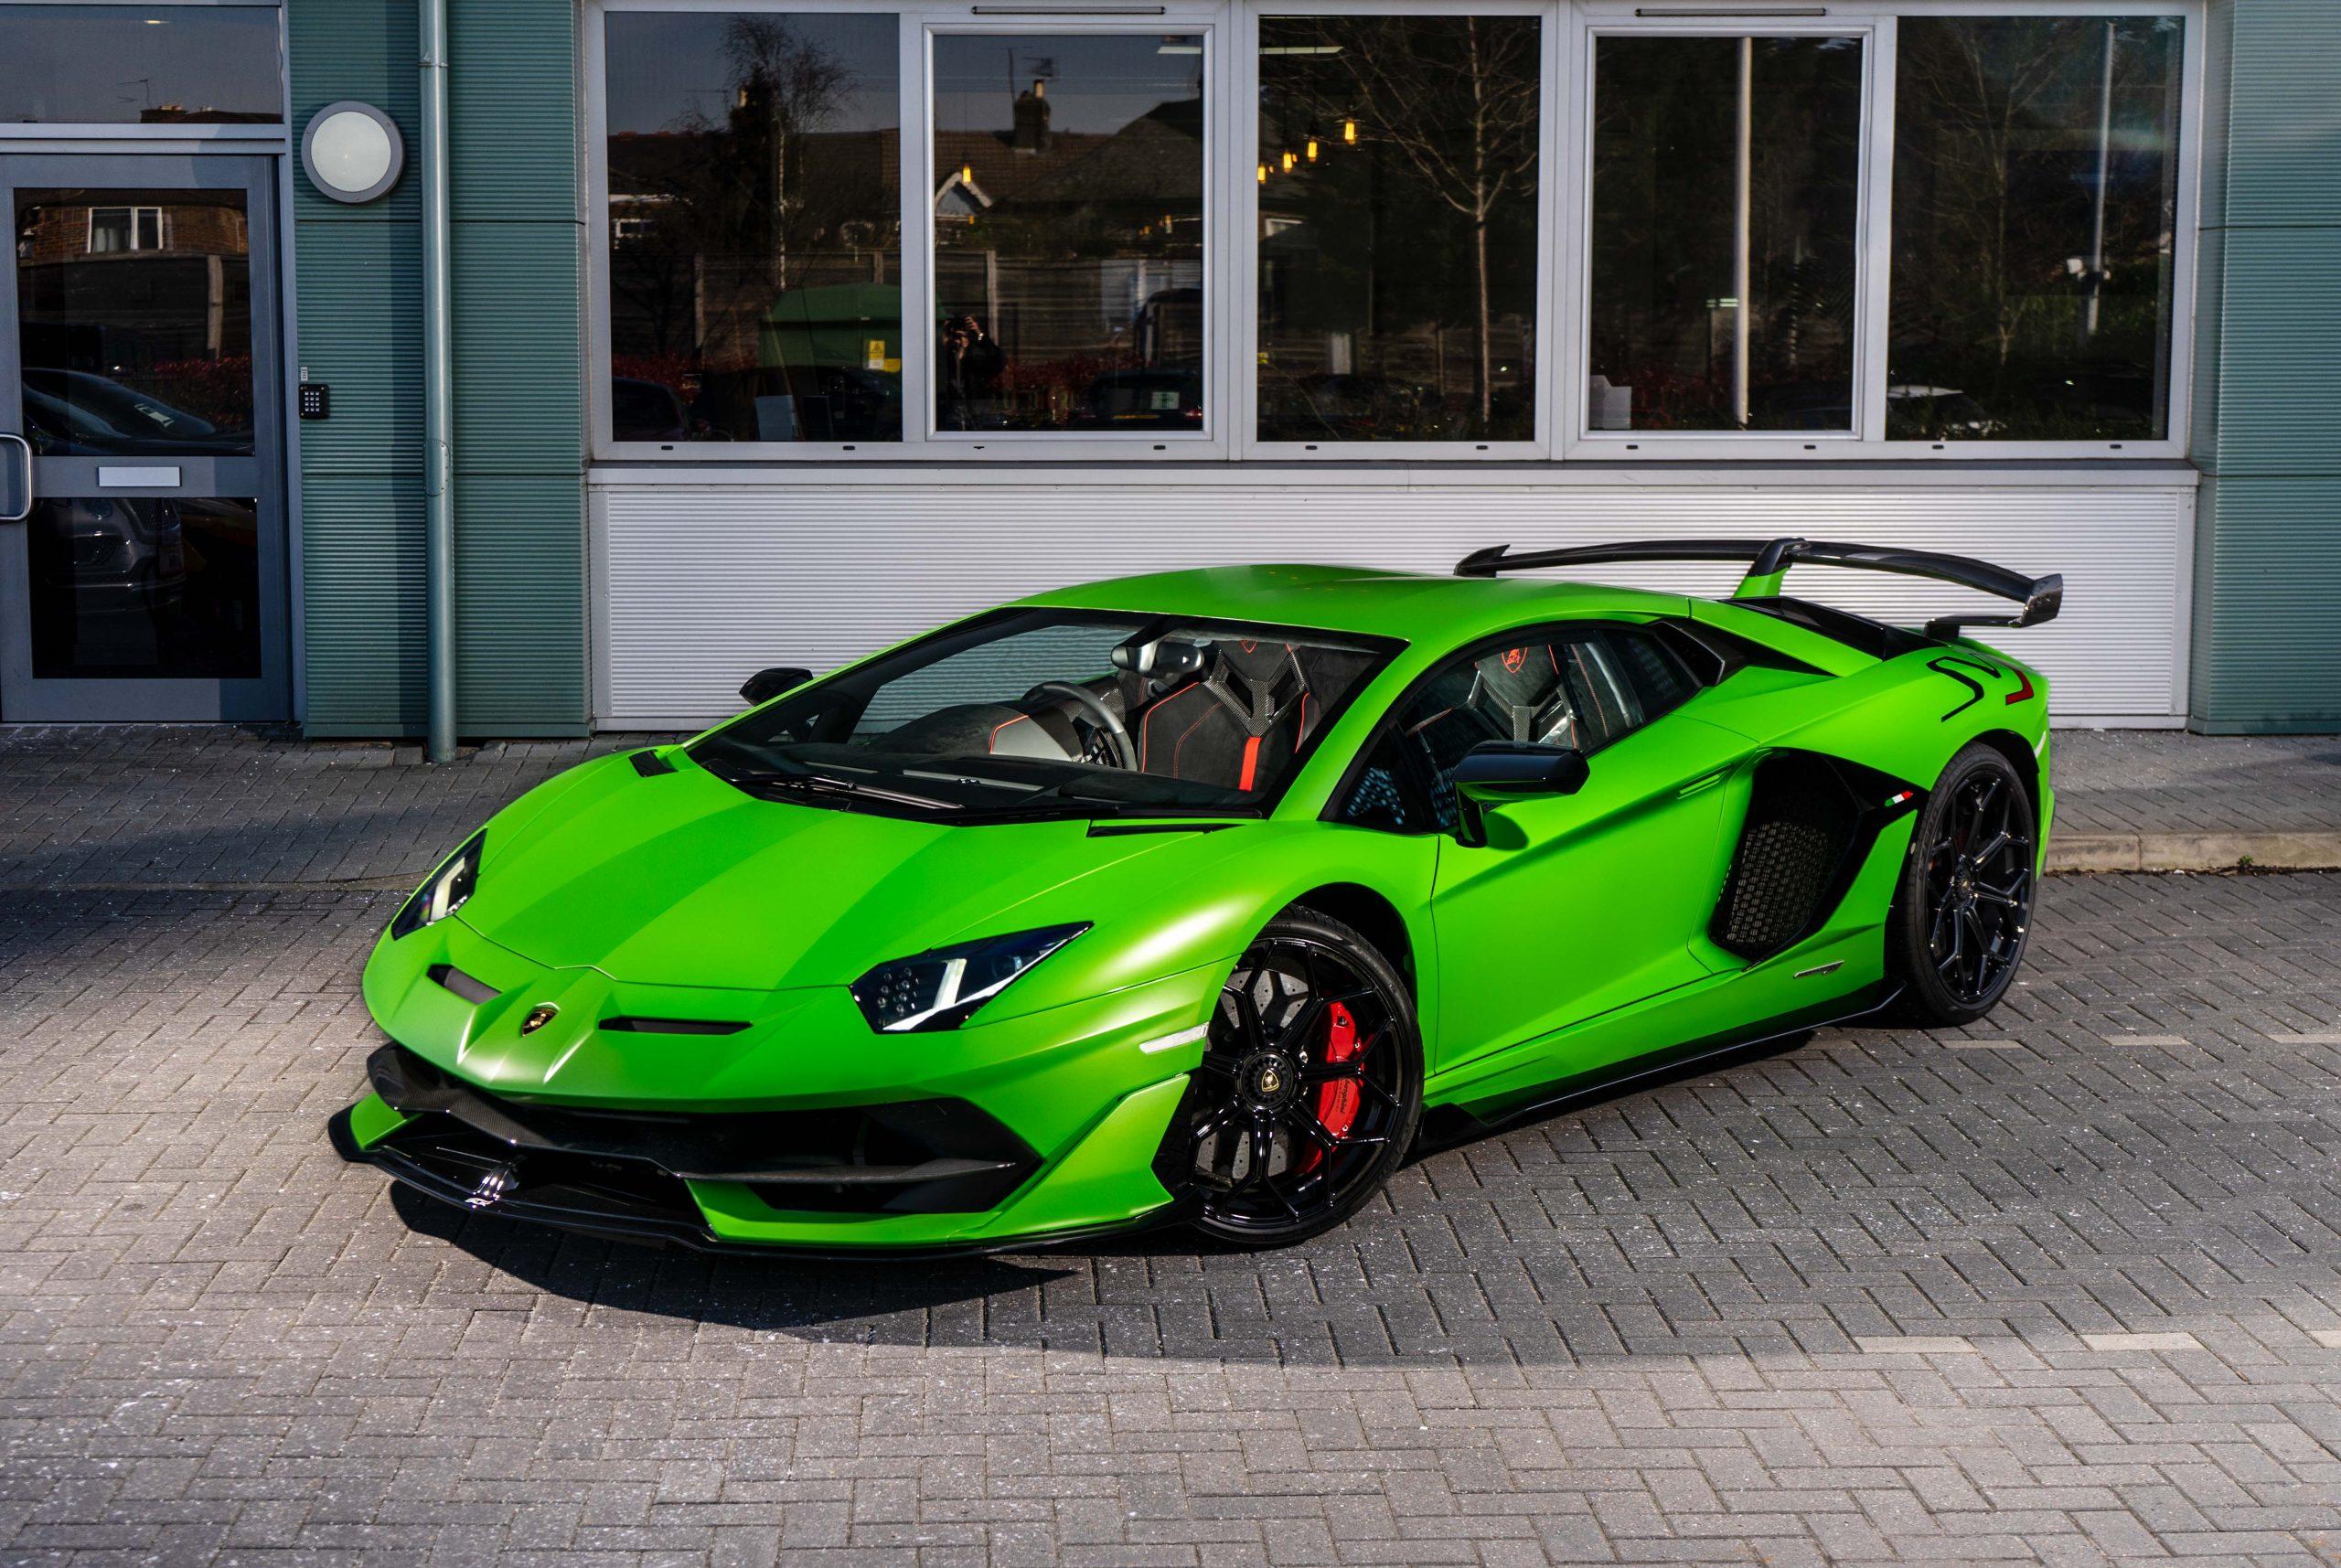 Green Lamborghini Aventador SVJ | Largest Supercar Dealership in the UK